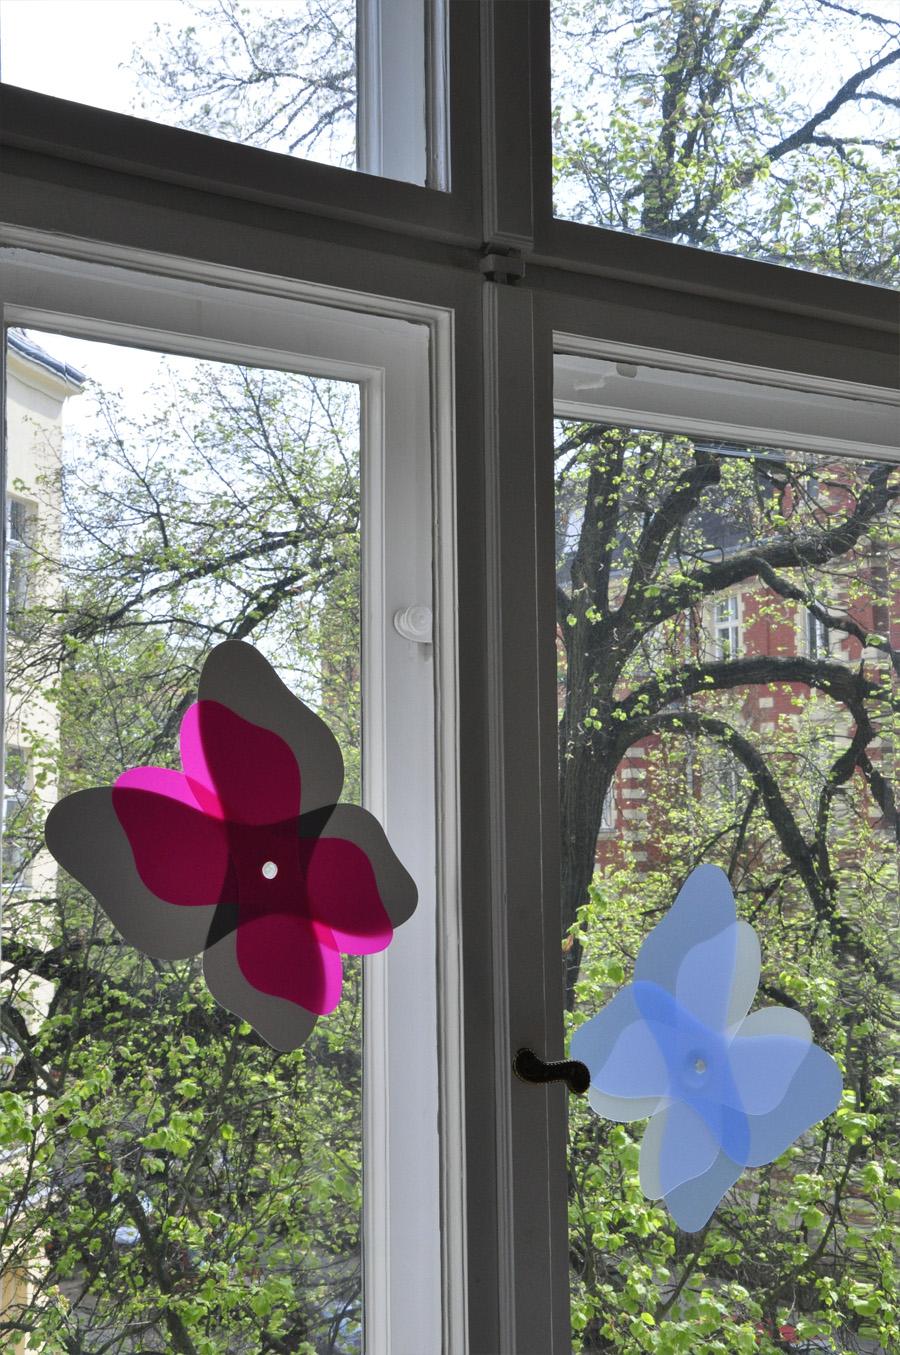 Freydenberg_Trans_Flower_Butterfly_28.jpg